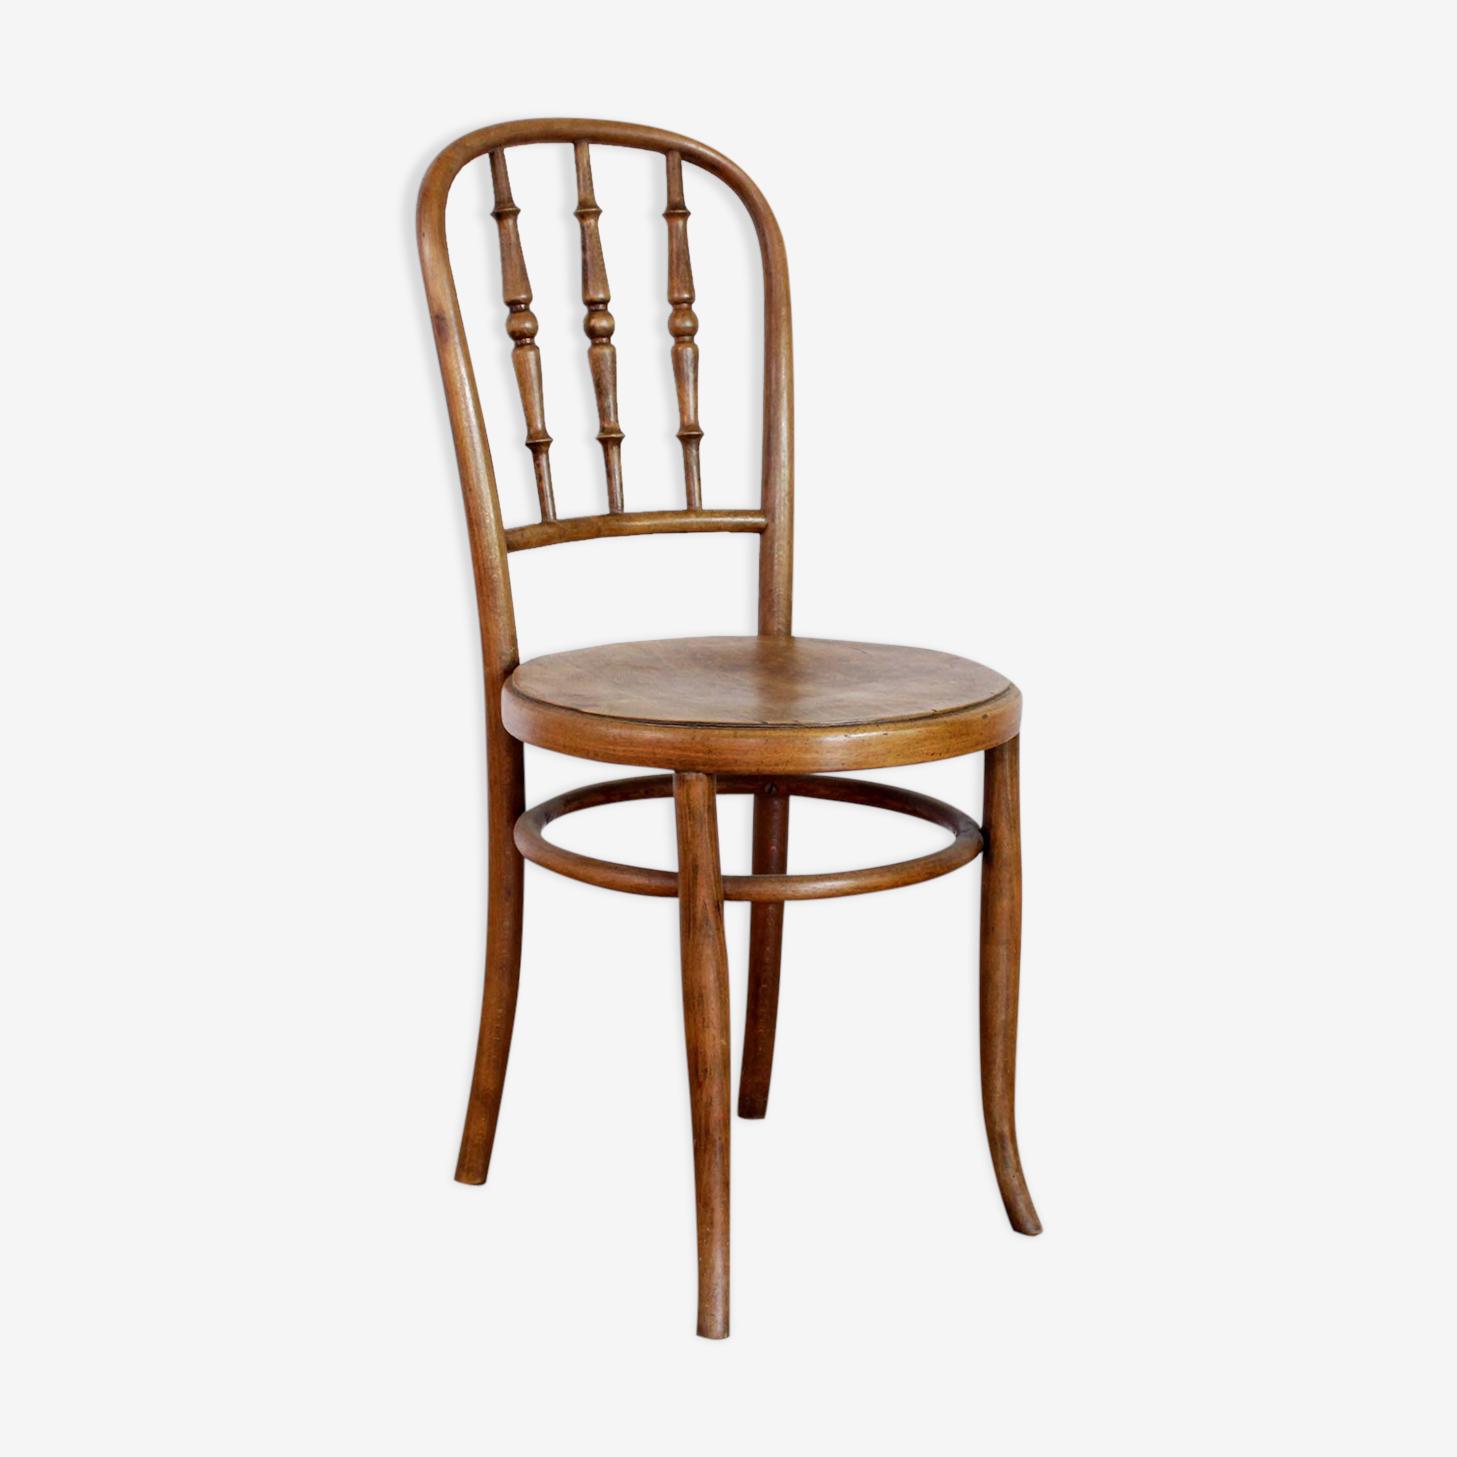 Belle chaise de bistrot fFschel